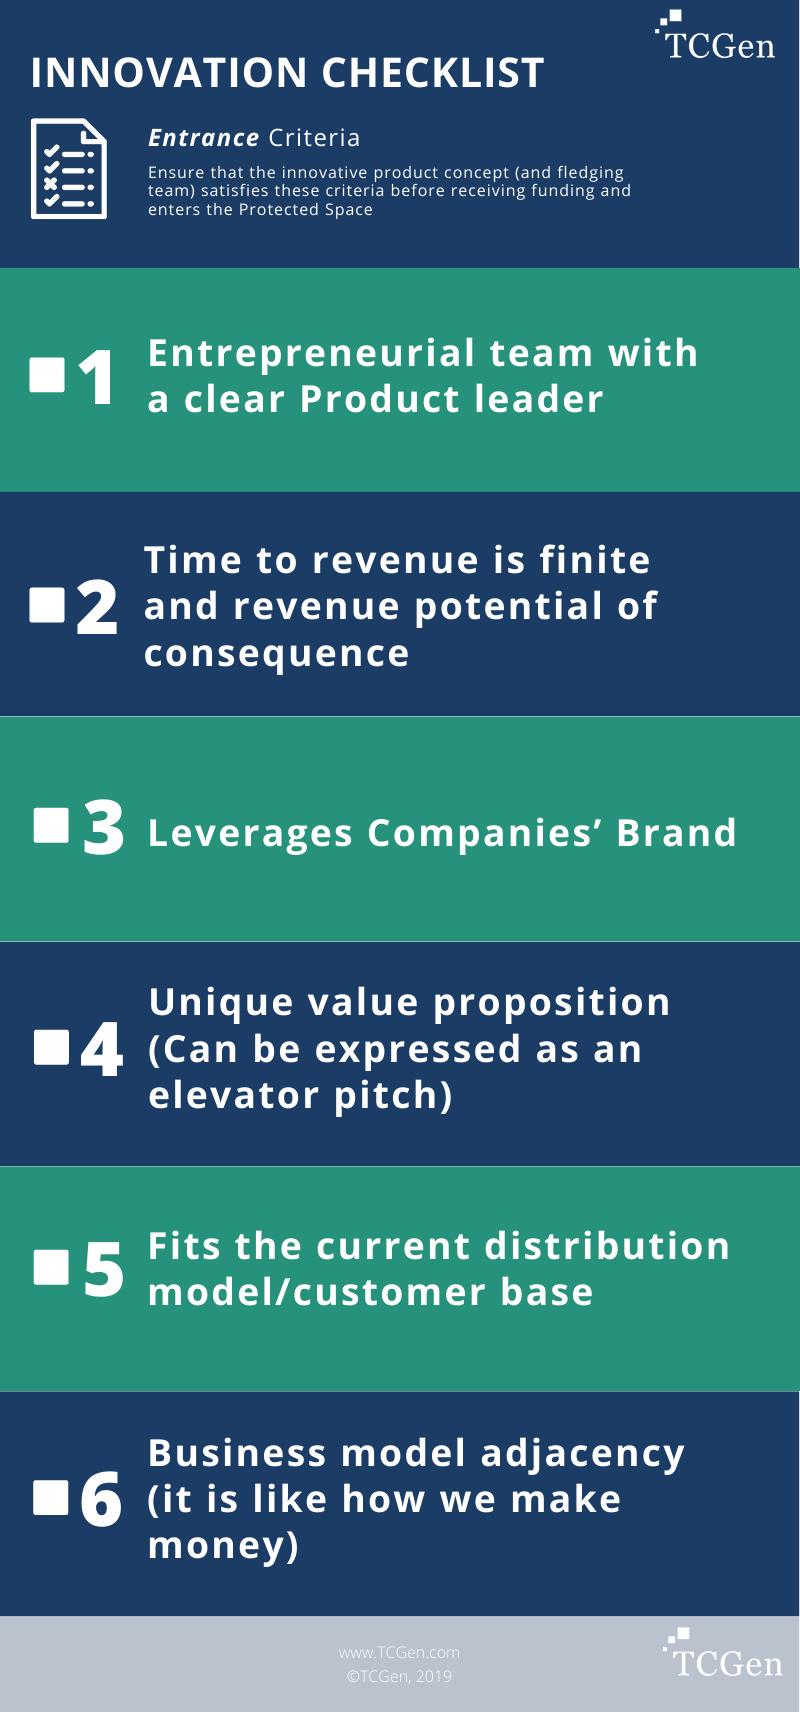 Innovation Checklist: Entrance Criteria